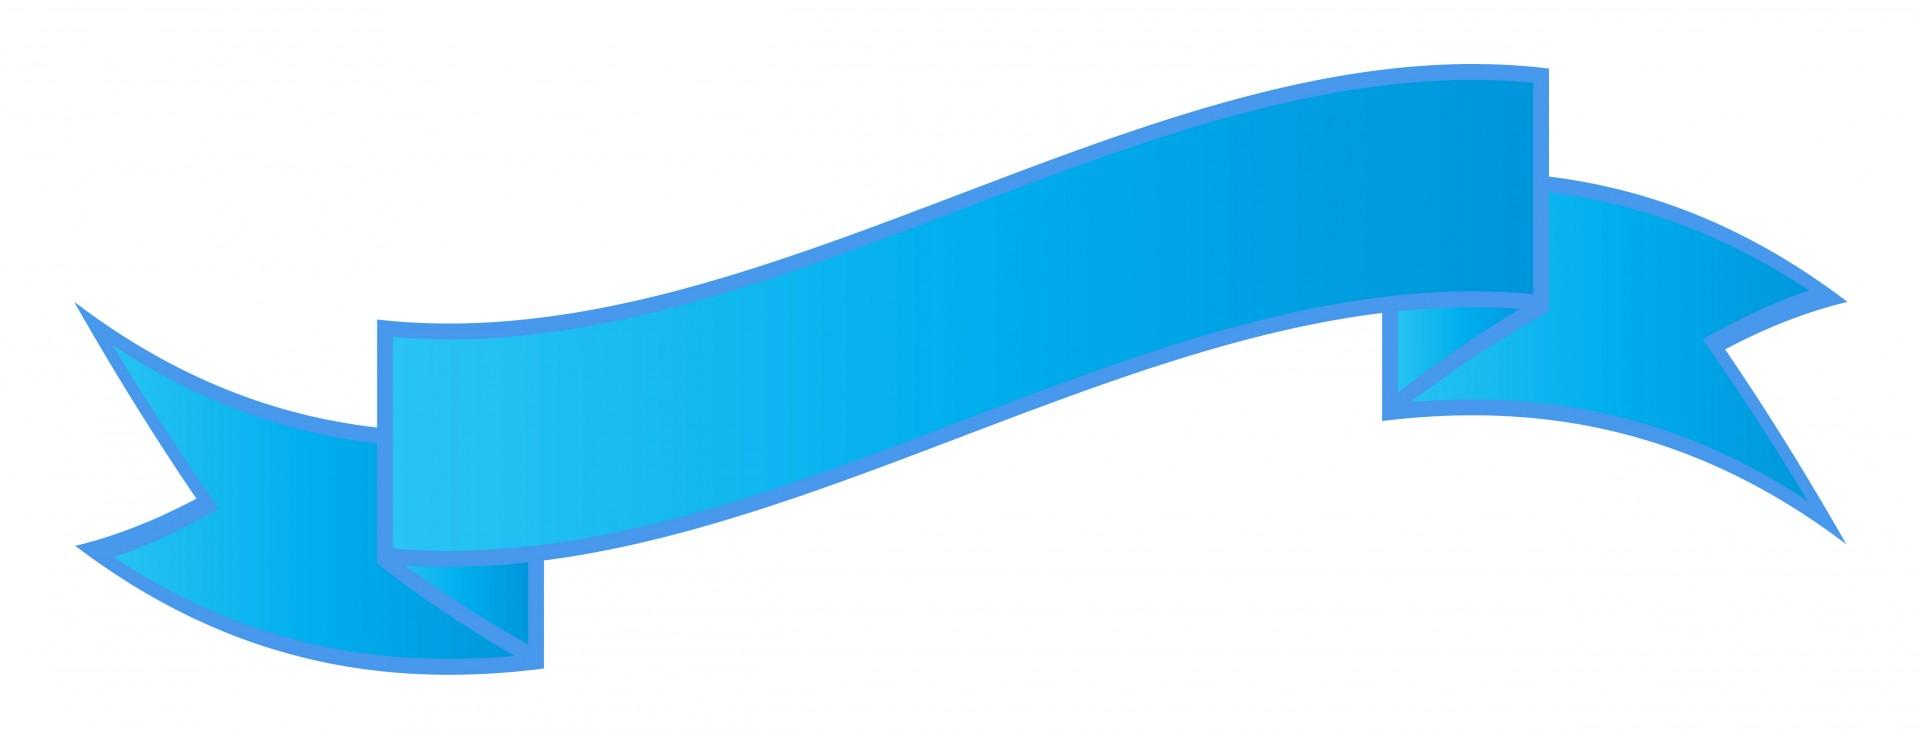 1920x734 Blue Ribbon Banner Free Stock Photo